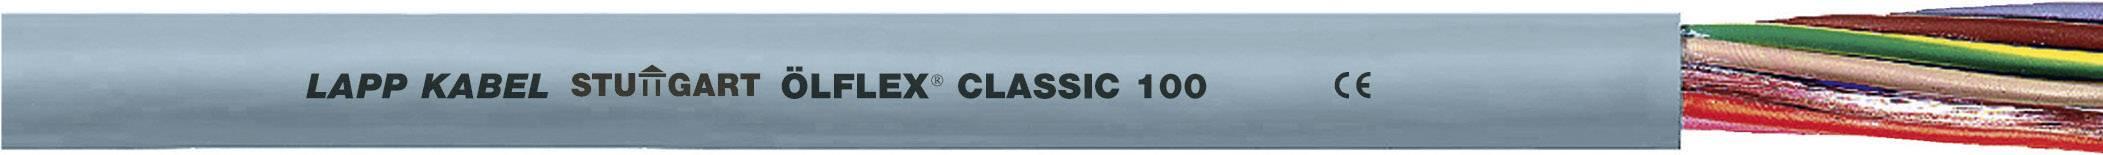 Kabel LappKabel Ölflex CLASSIC 100 3G120 (0010308), PVC, 47,6 mm, 750 V, šedá, 300 m